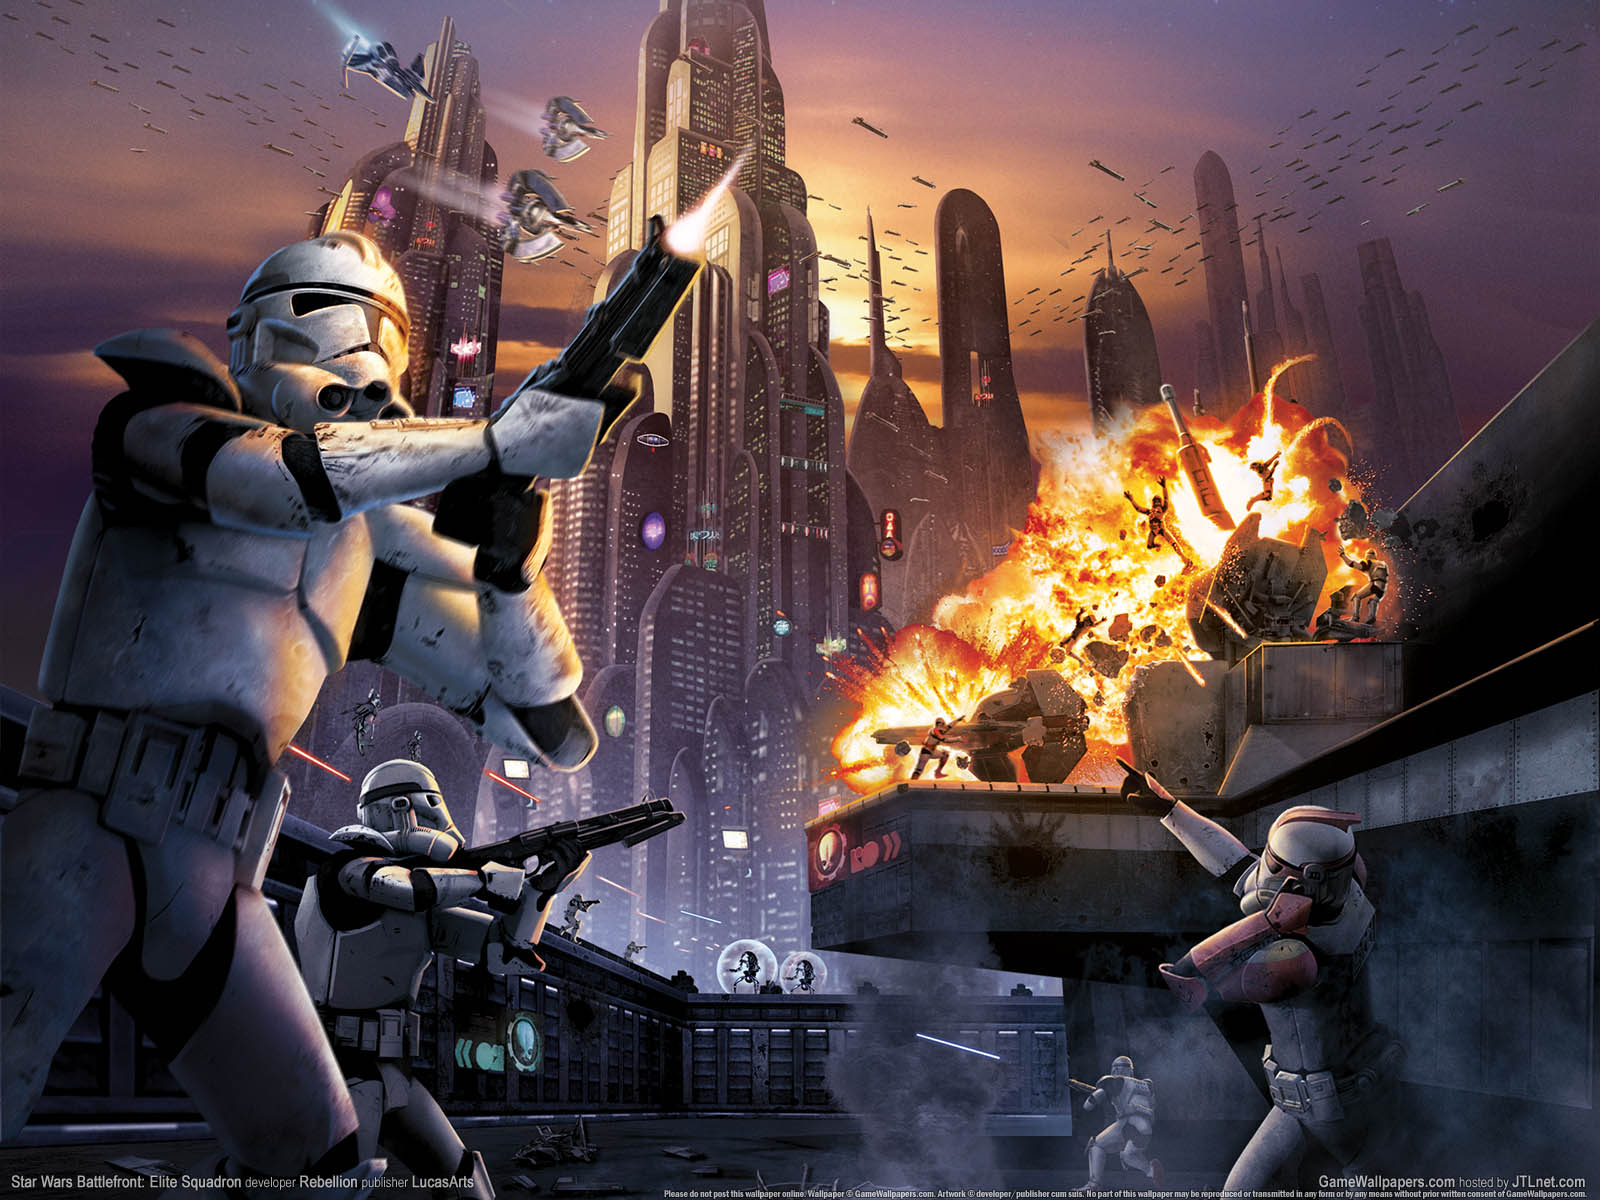 http://1.bp.blogspot.com/-HHBevyevQU4/UFuGUdmNKTI/AAAAAAAAARg/yOj3sskWKDg/s1600/Star_Wars_Battlefront_-_Elite_Squadron.jpg